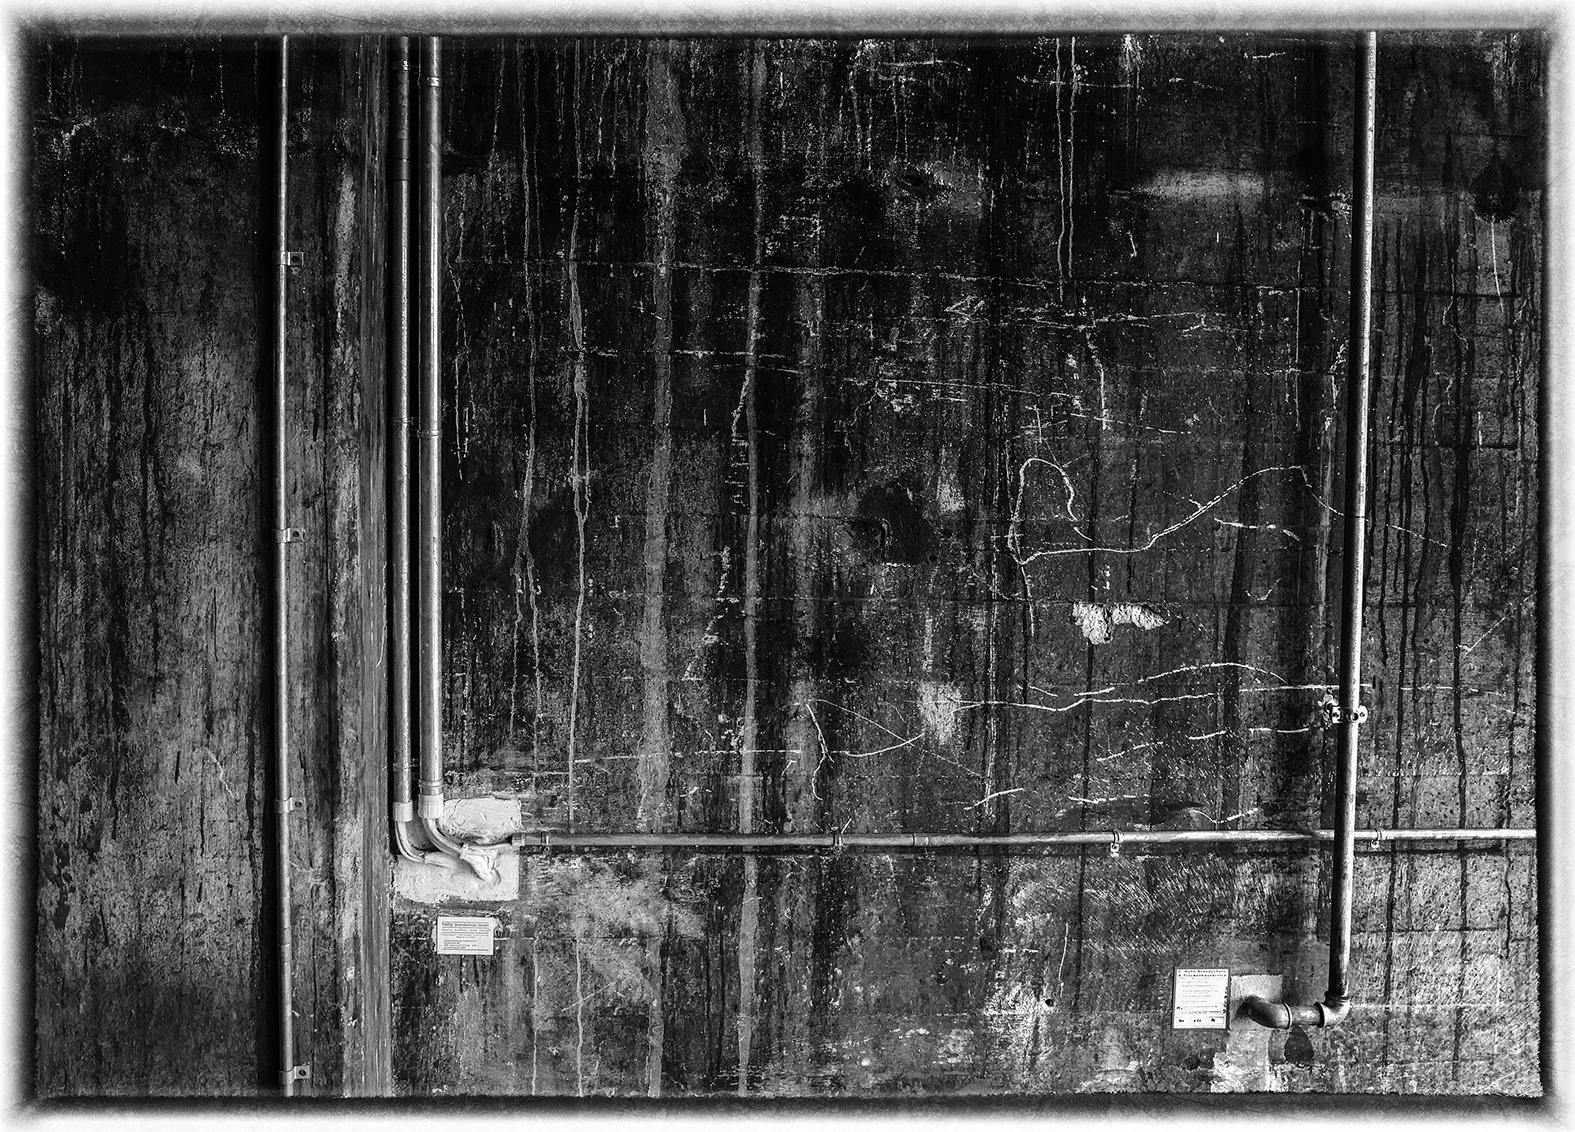 015 Zeche Zollverein.jpg